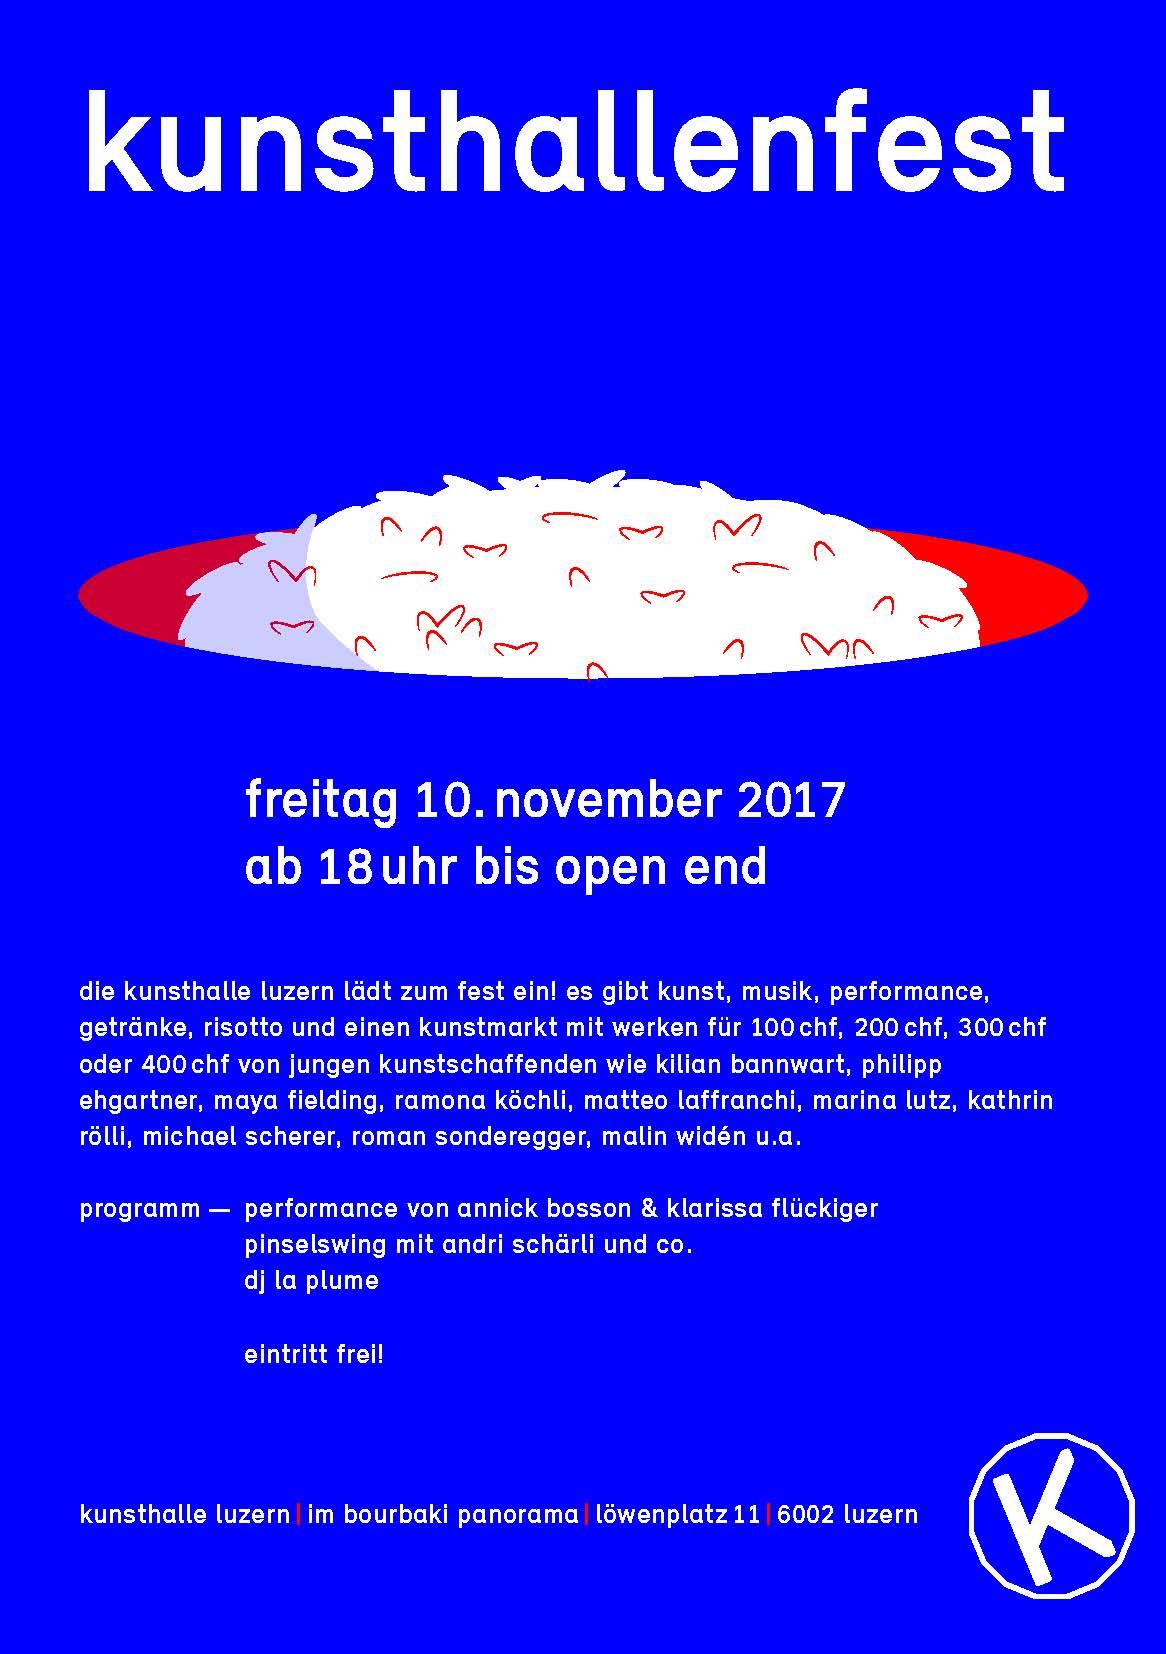 Kunsthallenfest